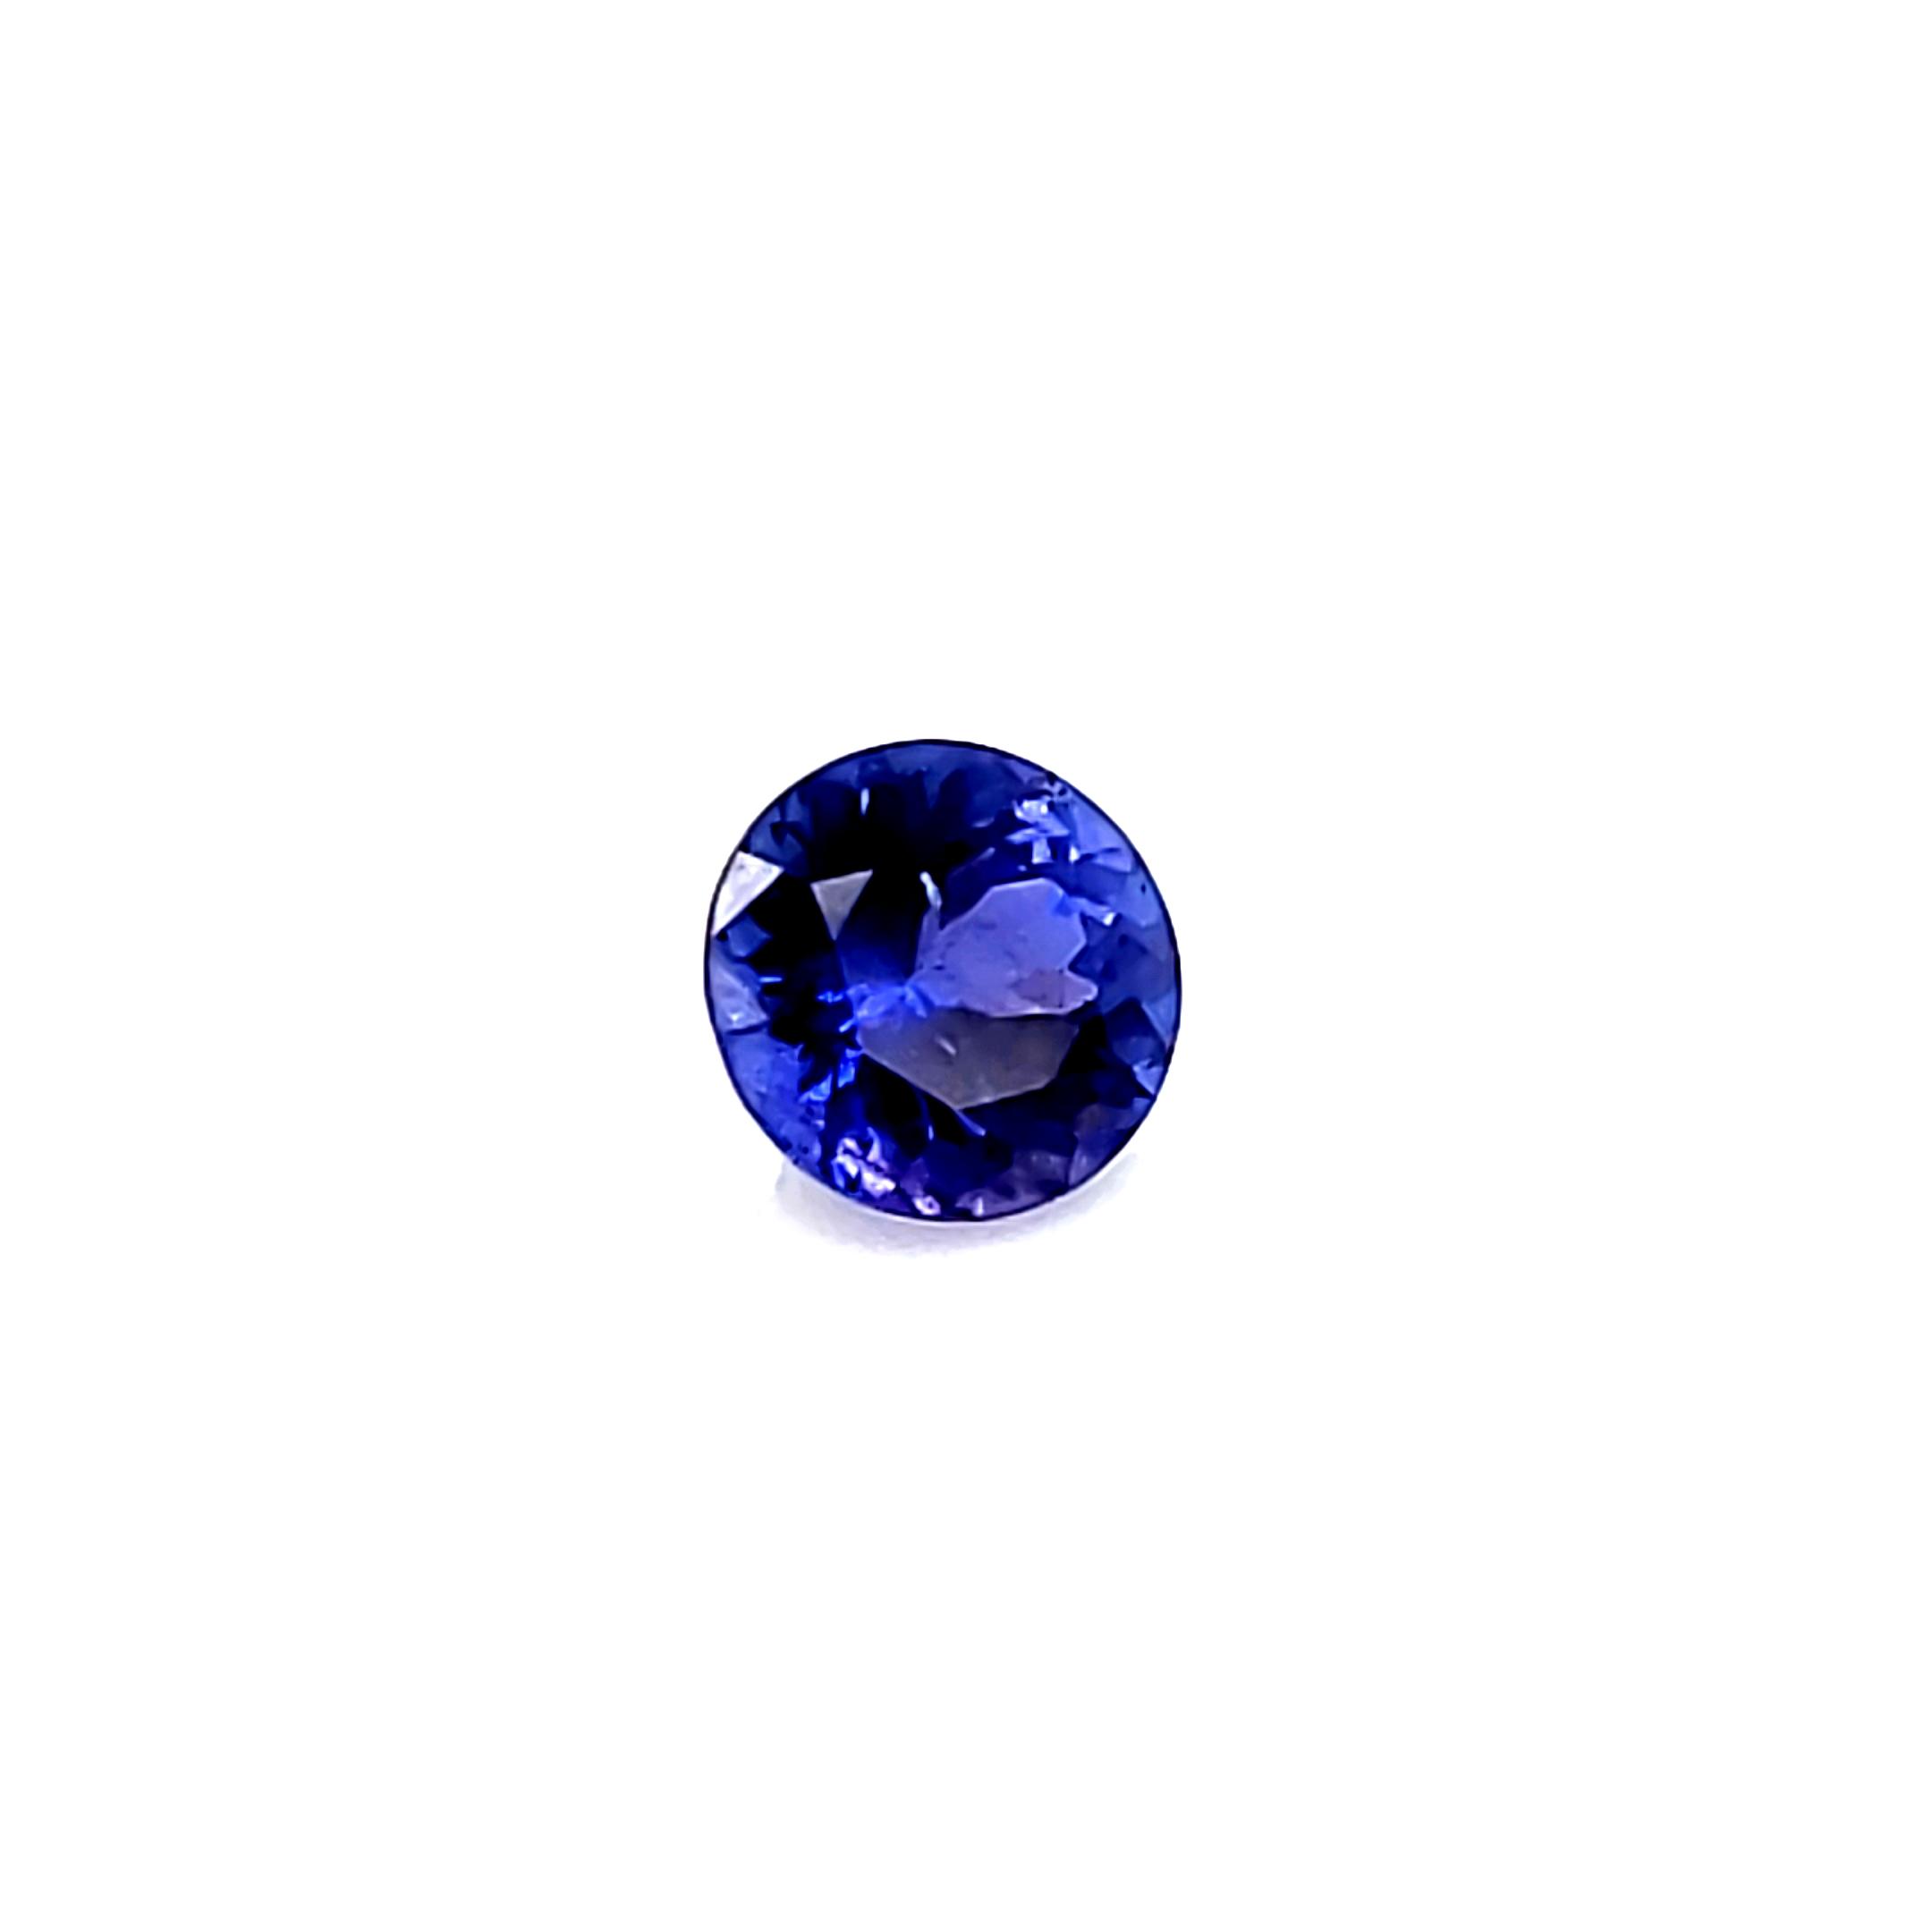 .31 ct. Color Change Sapphire